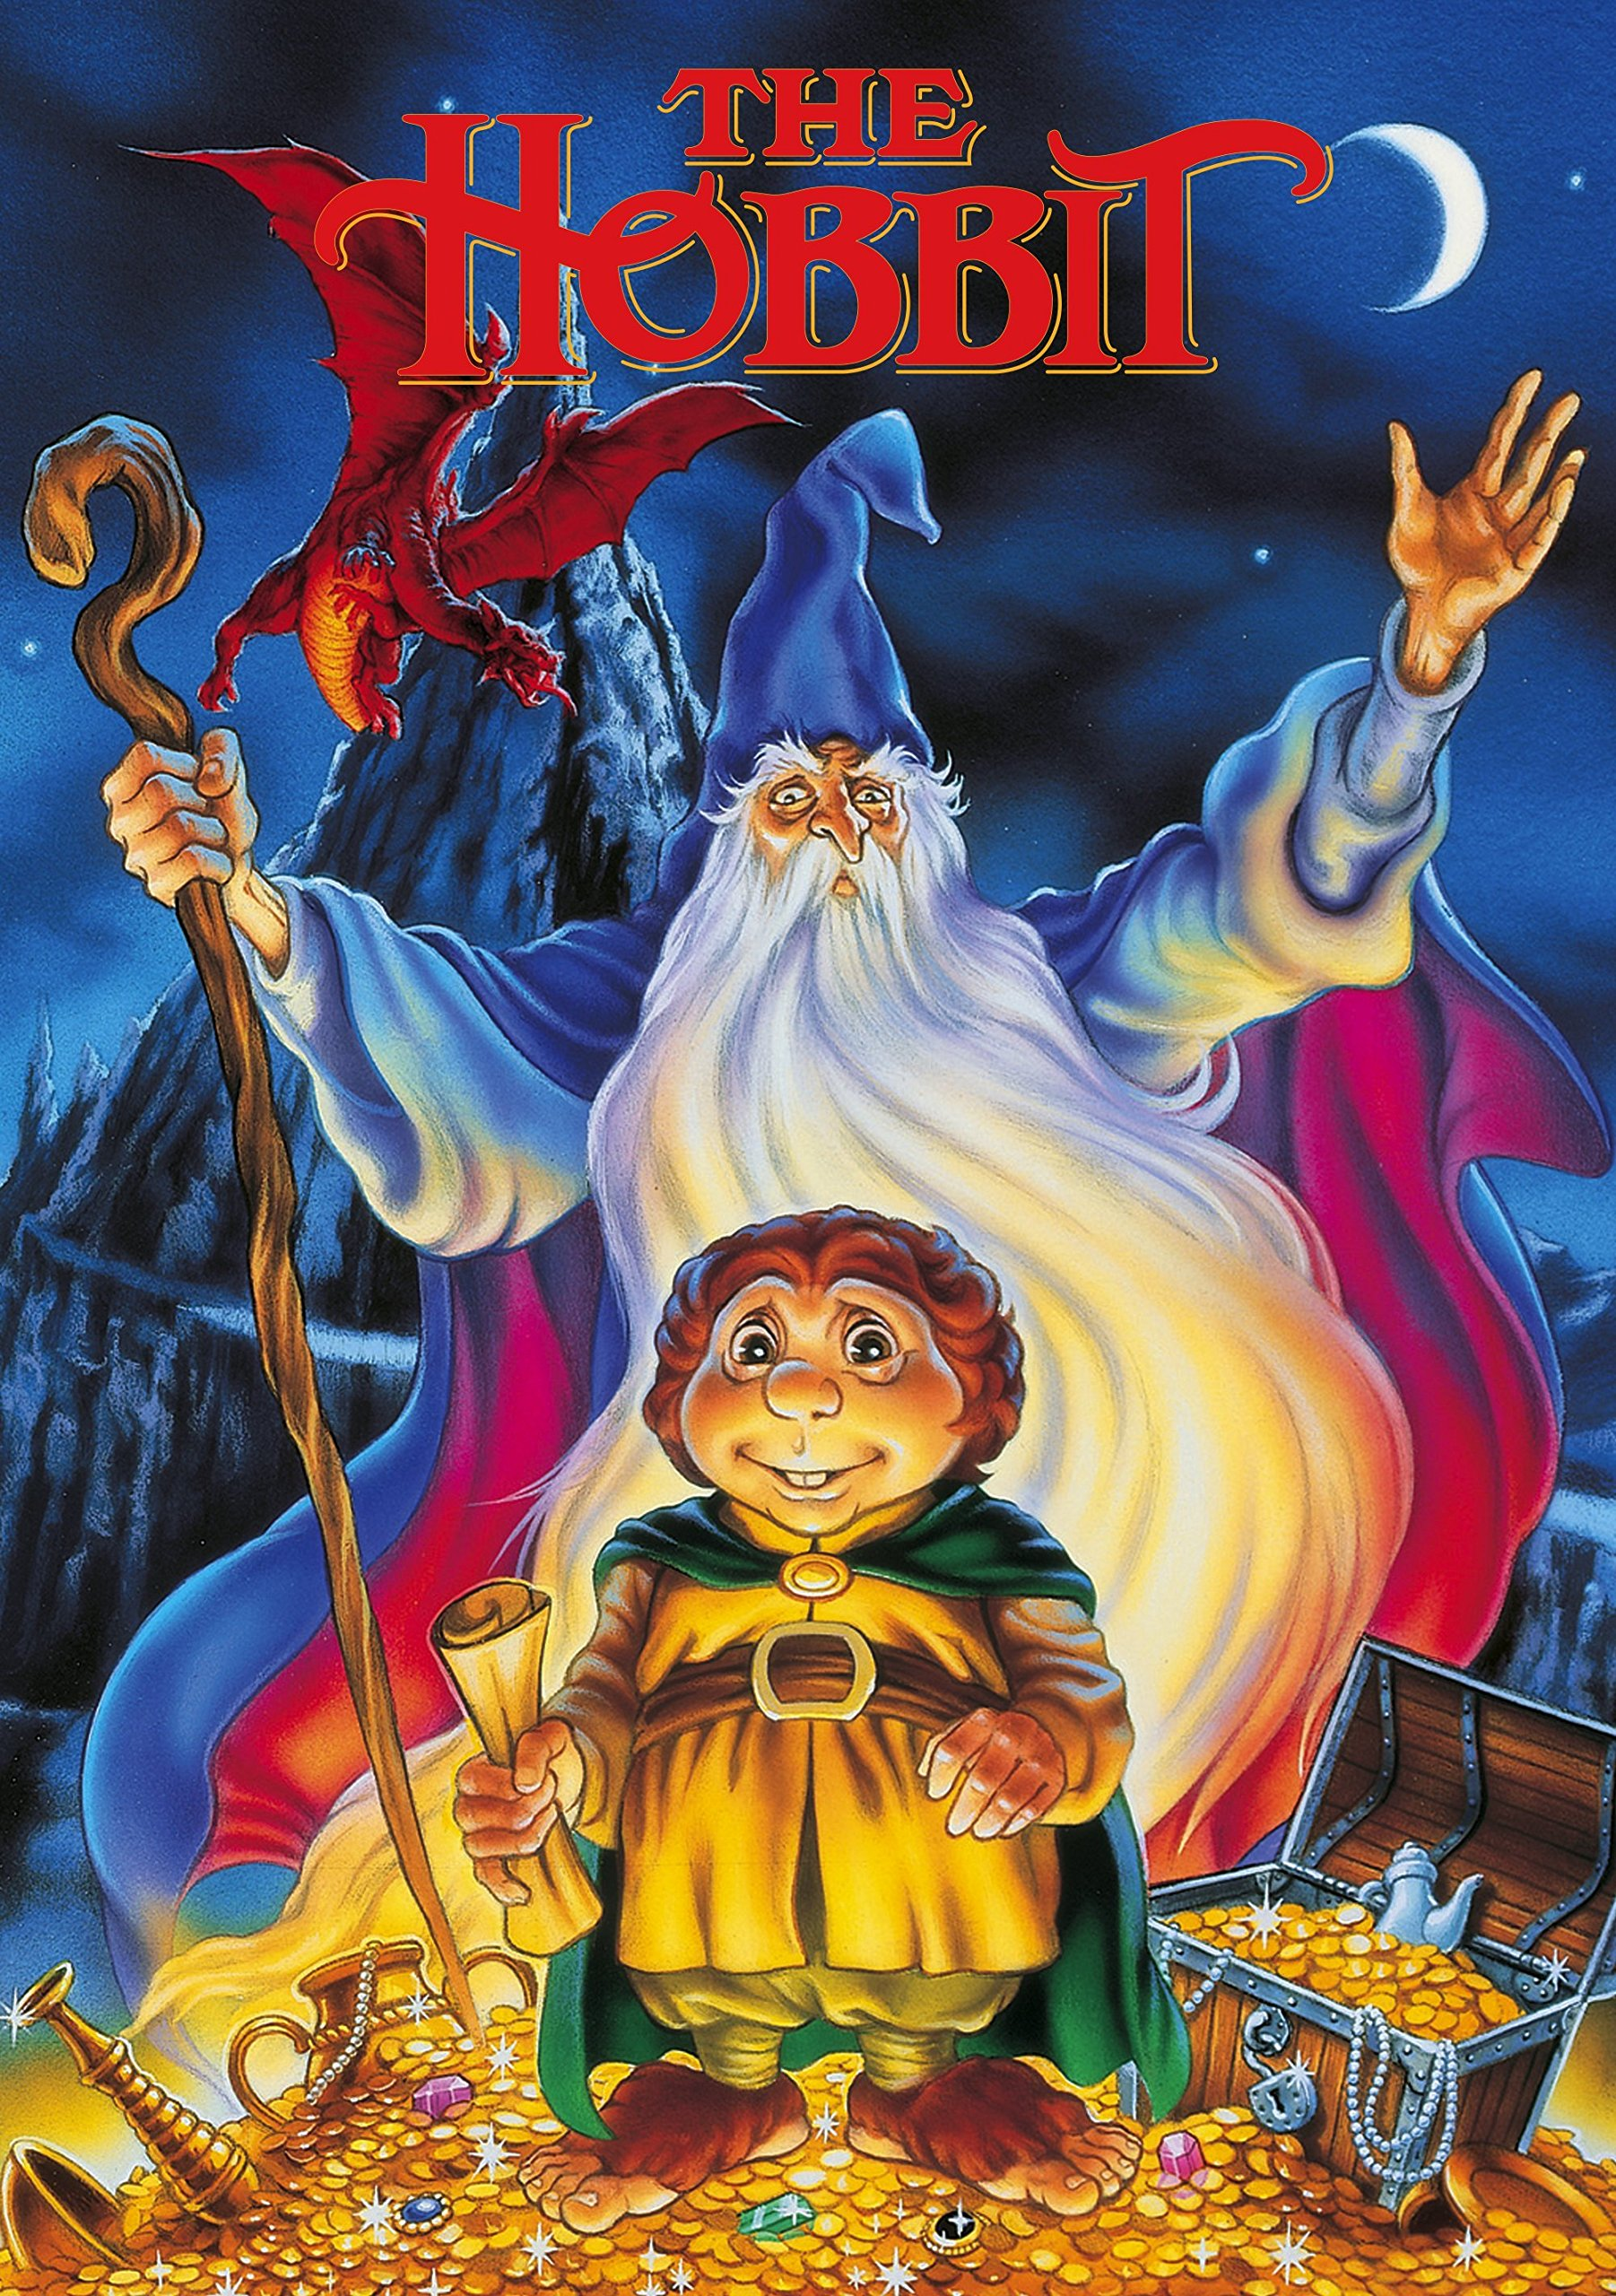 The Hobbit (1977 animated film)